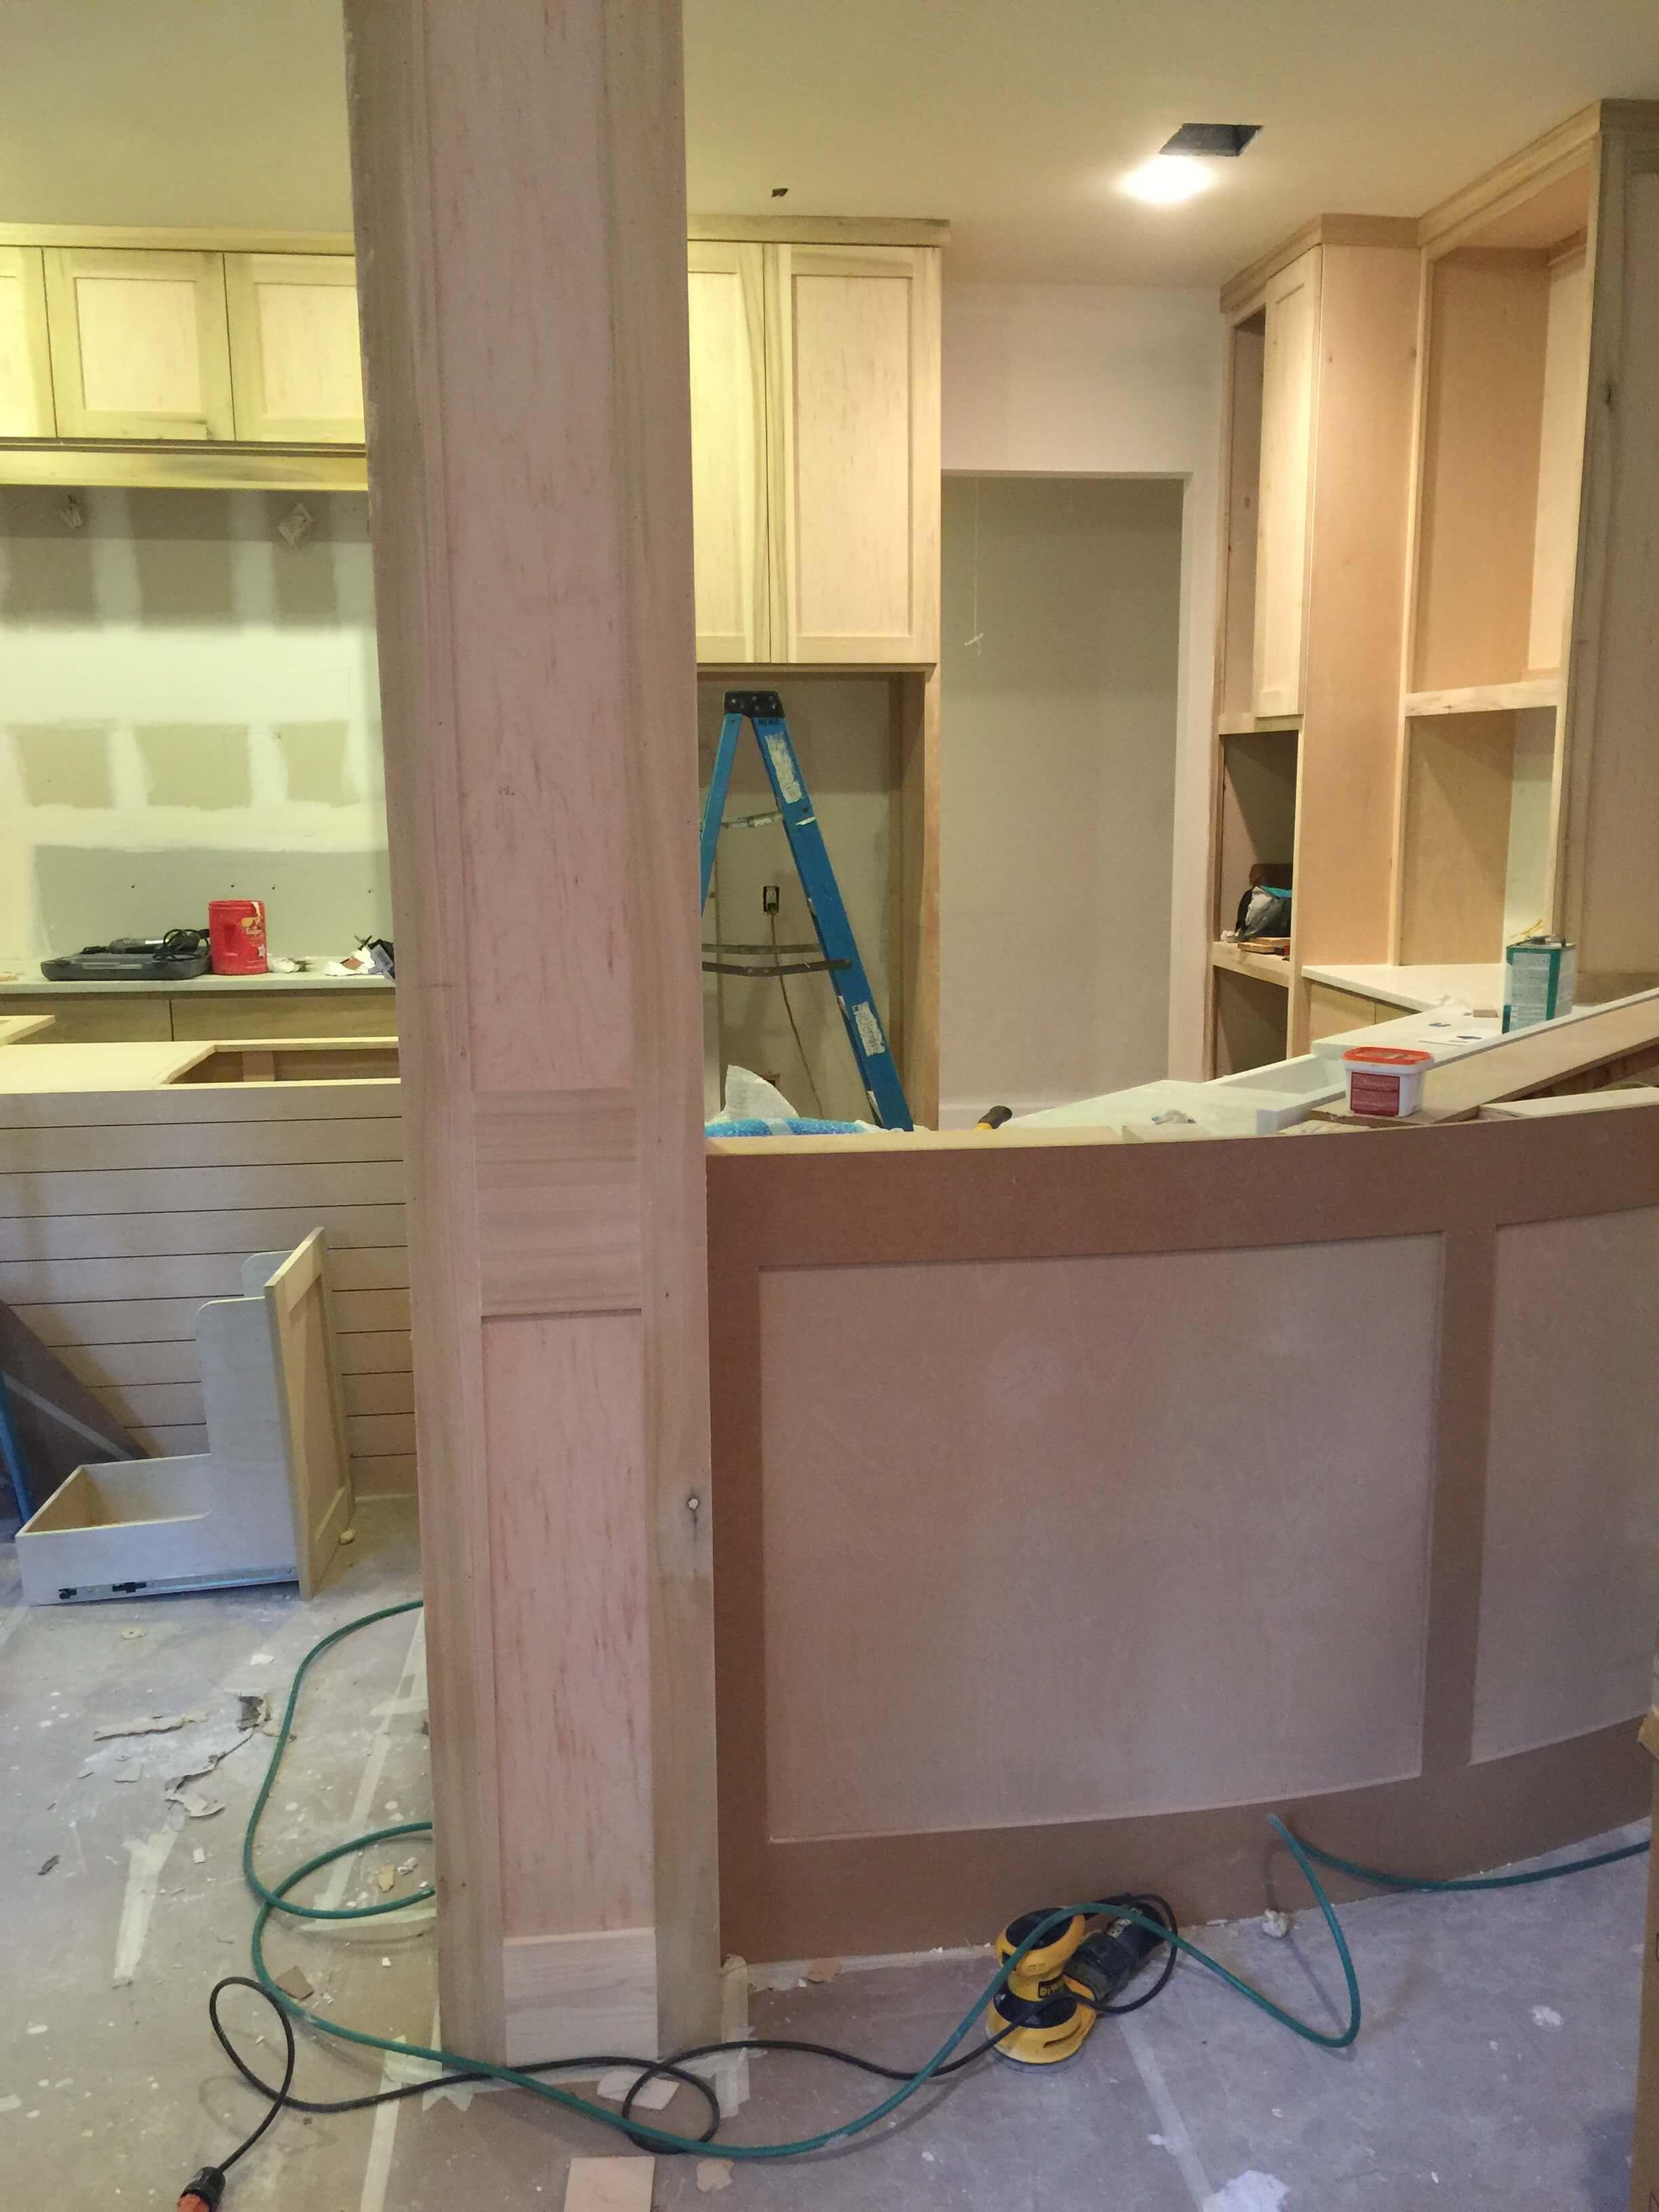 IN PROGRESS - Kitchen column and bar face getting paneled in kitchen remodel | Carla Aston, Designer